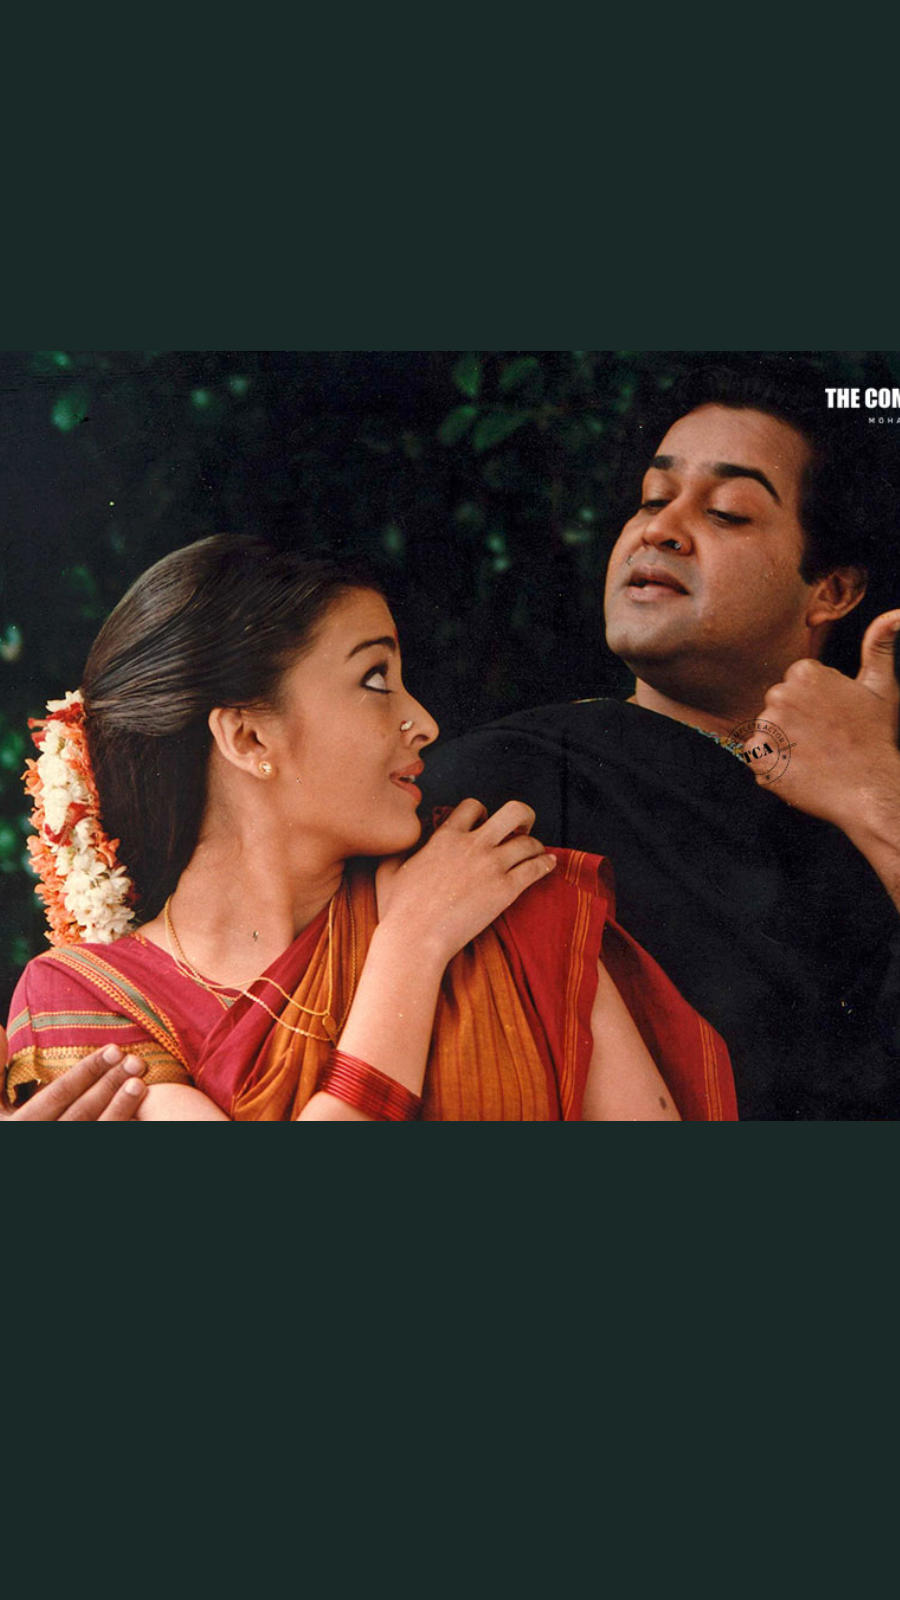 Aishwarya Rai's first onscreen hero